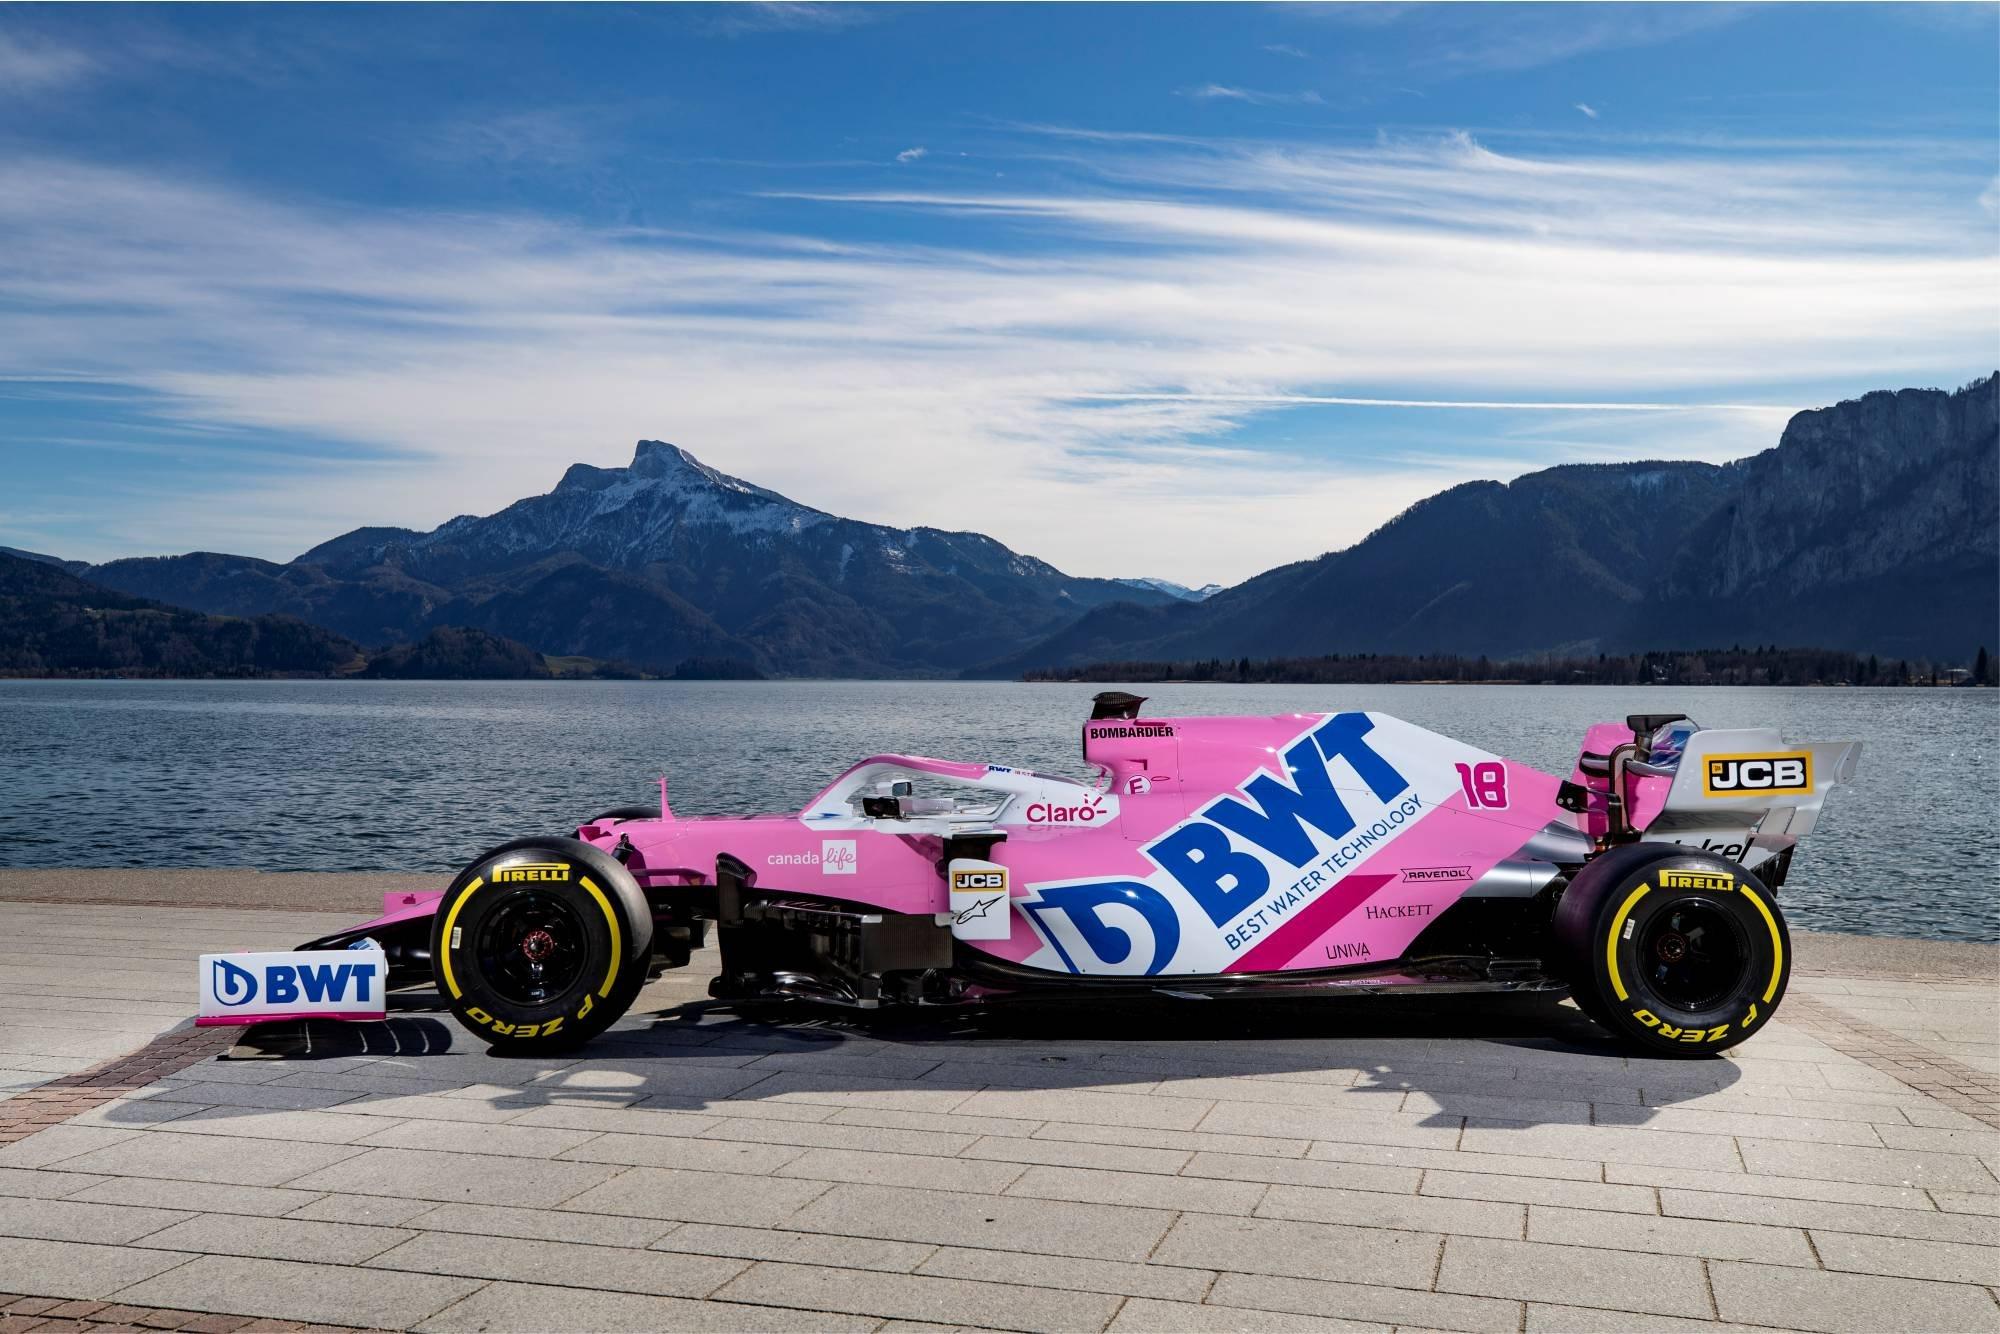 F1 Formula 1 Racing Point RP20 BWT title sponsors